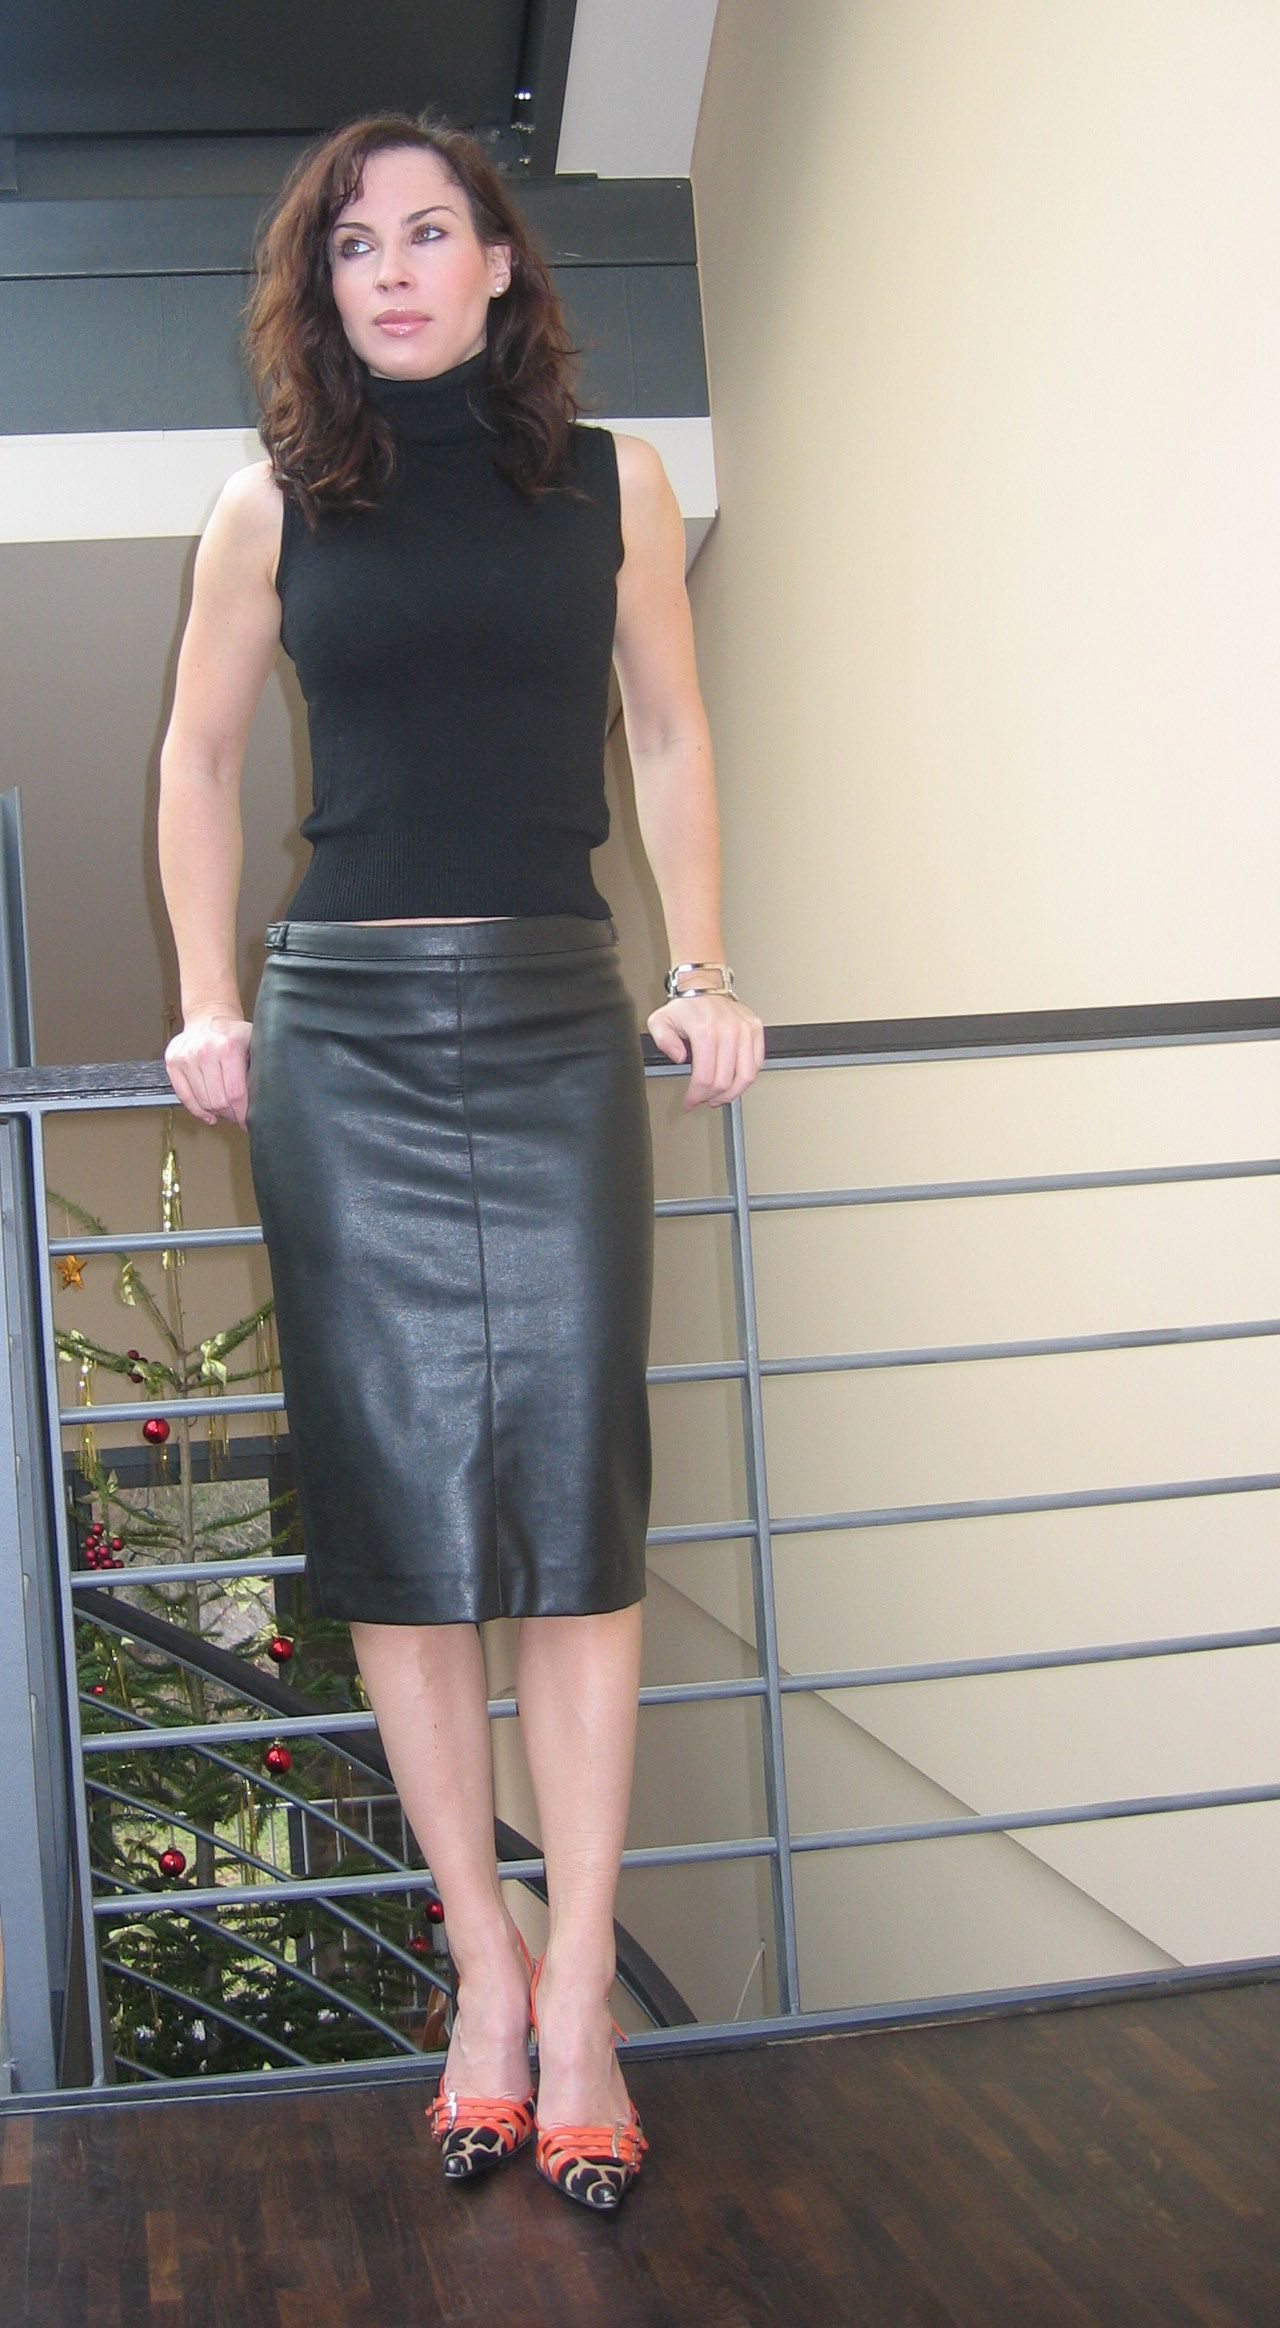 pin by hugo schmitz on leather skirt